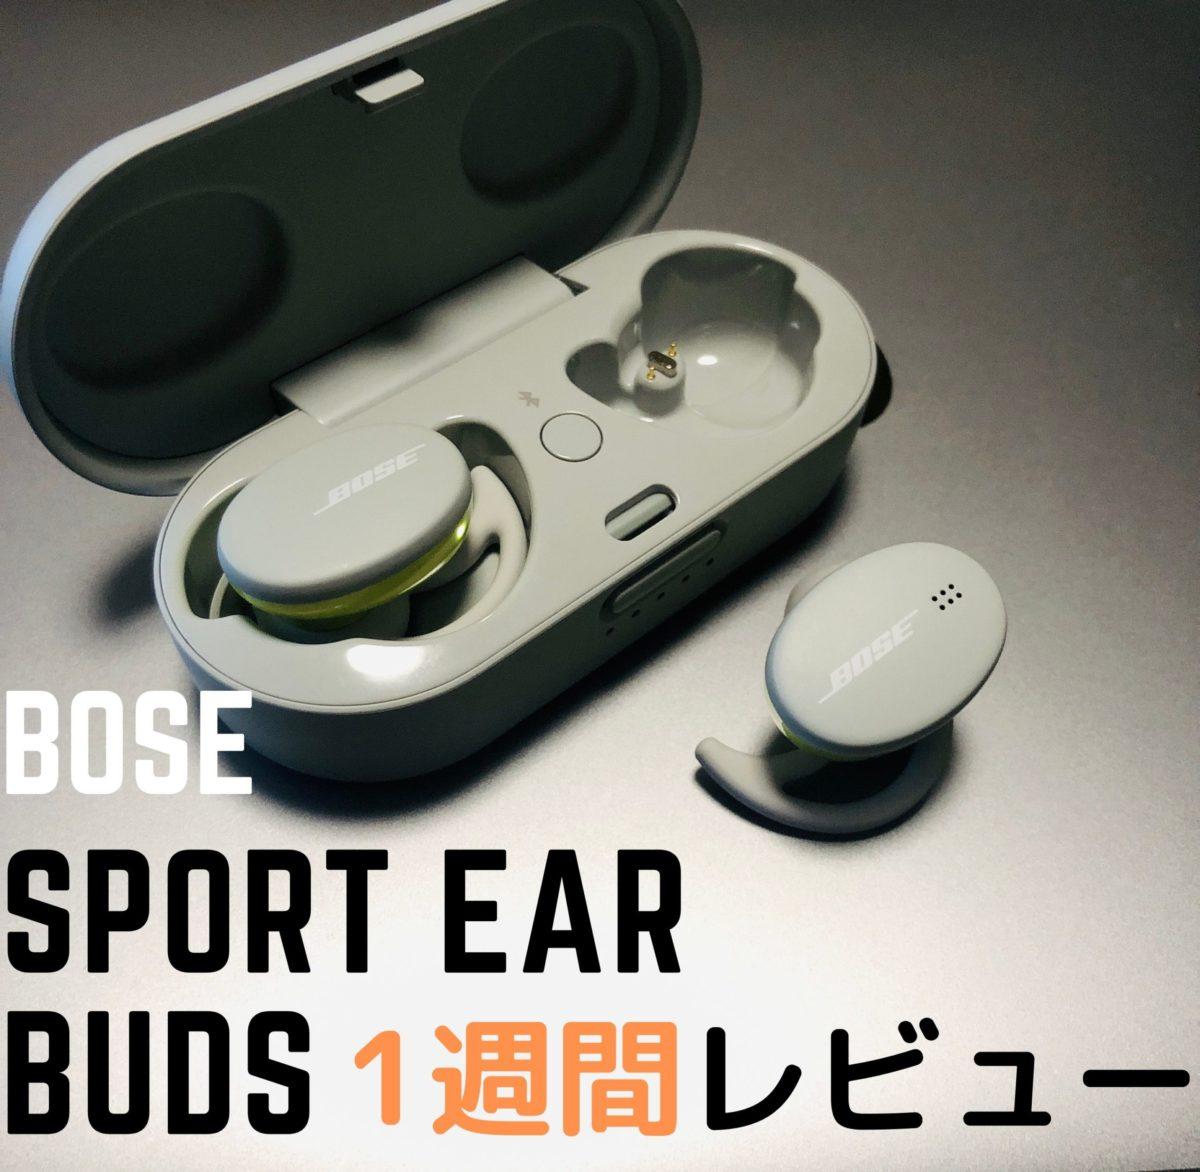 【BOSE】ワイヤレスイヤホンSportEarbuds1週間レビュー